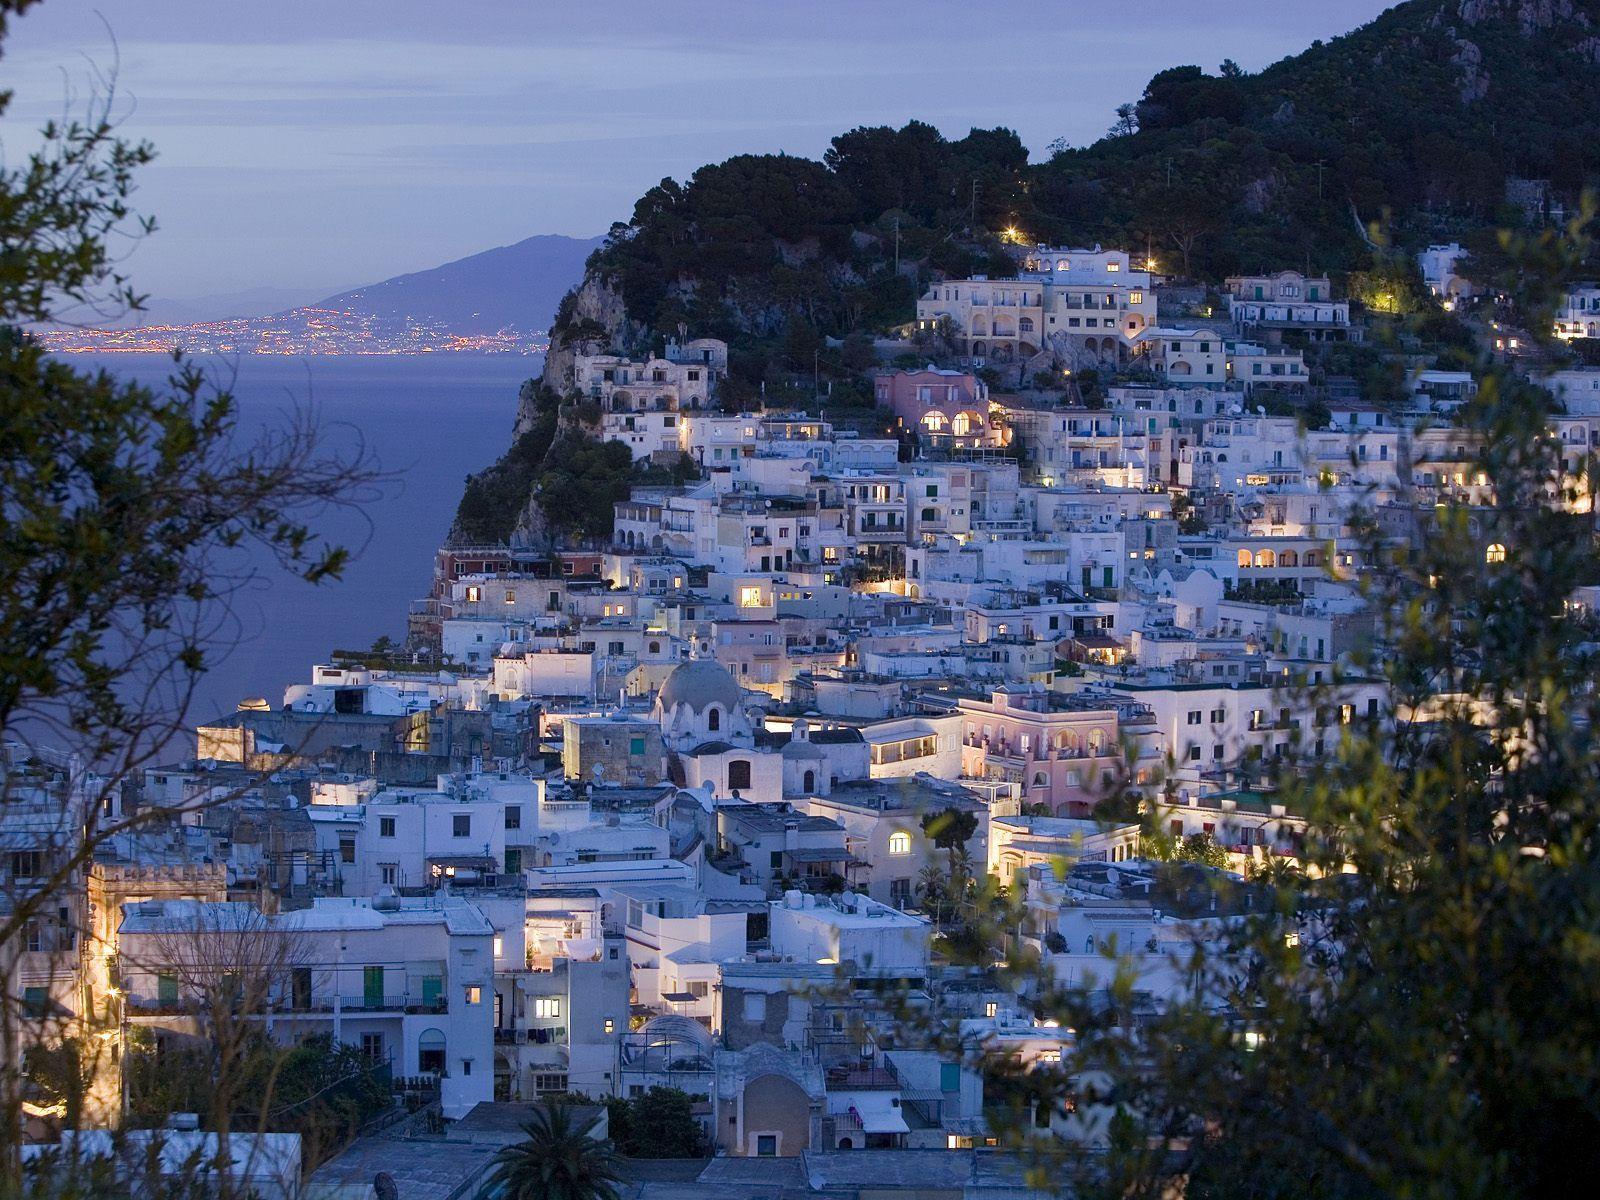 edge of the Bay of Naples,napoli town